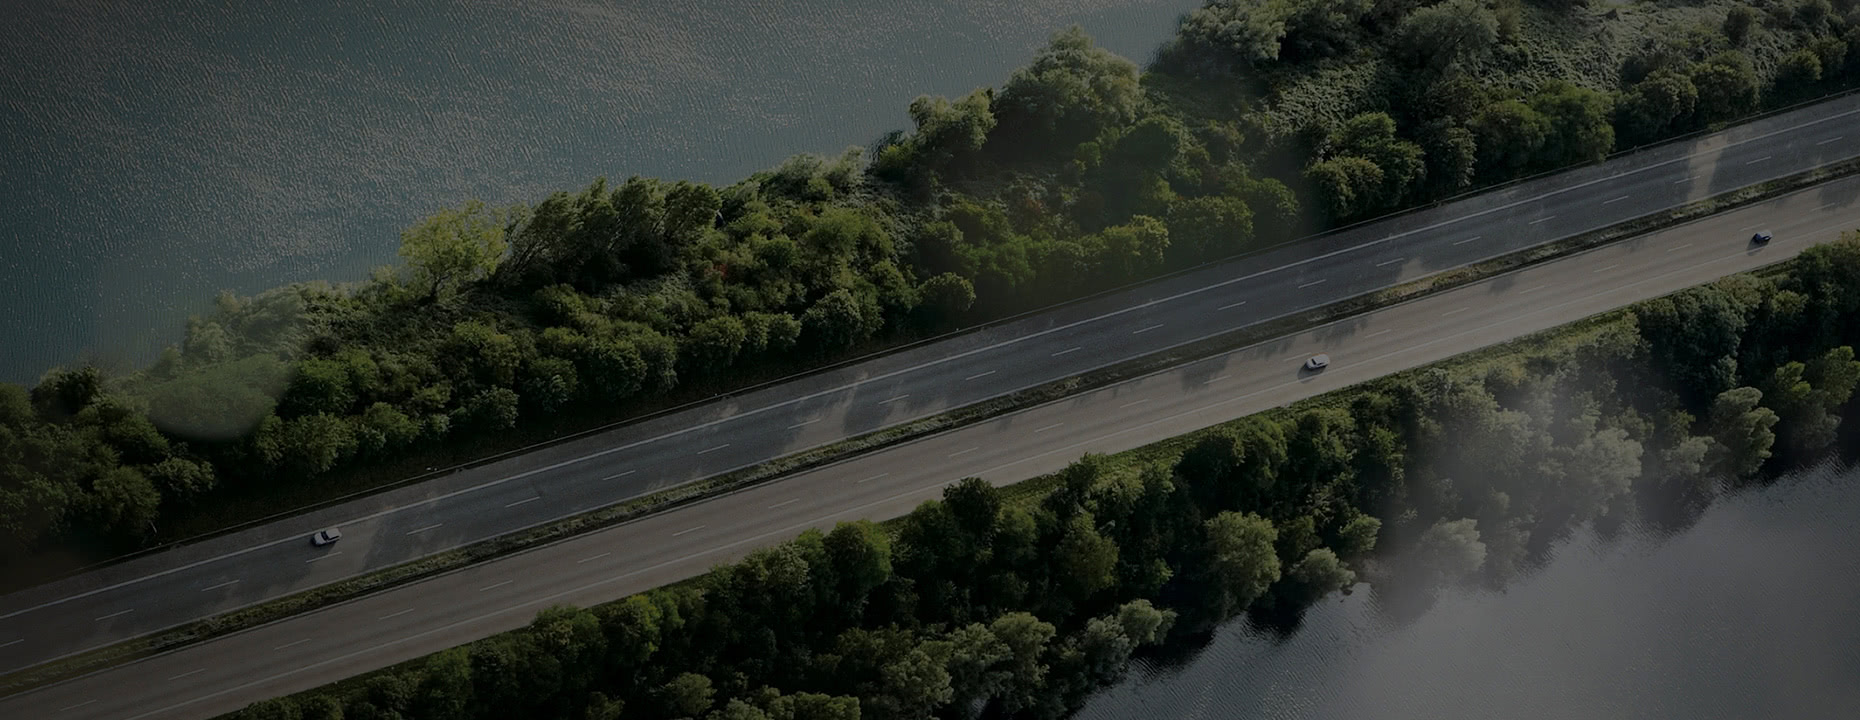 Тест-драйв Hyundai Elantra: Не просто красуня | ТОВ «АлексСхід» - фото 20